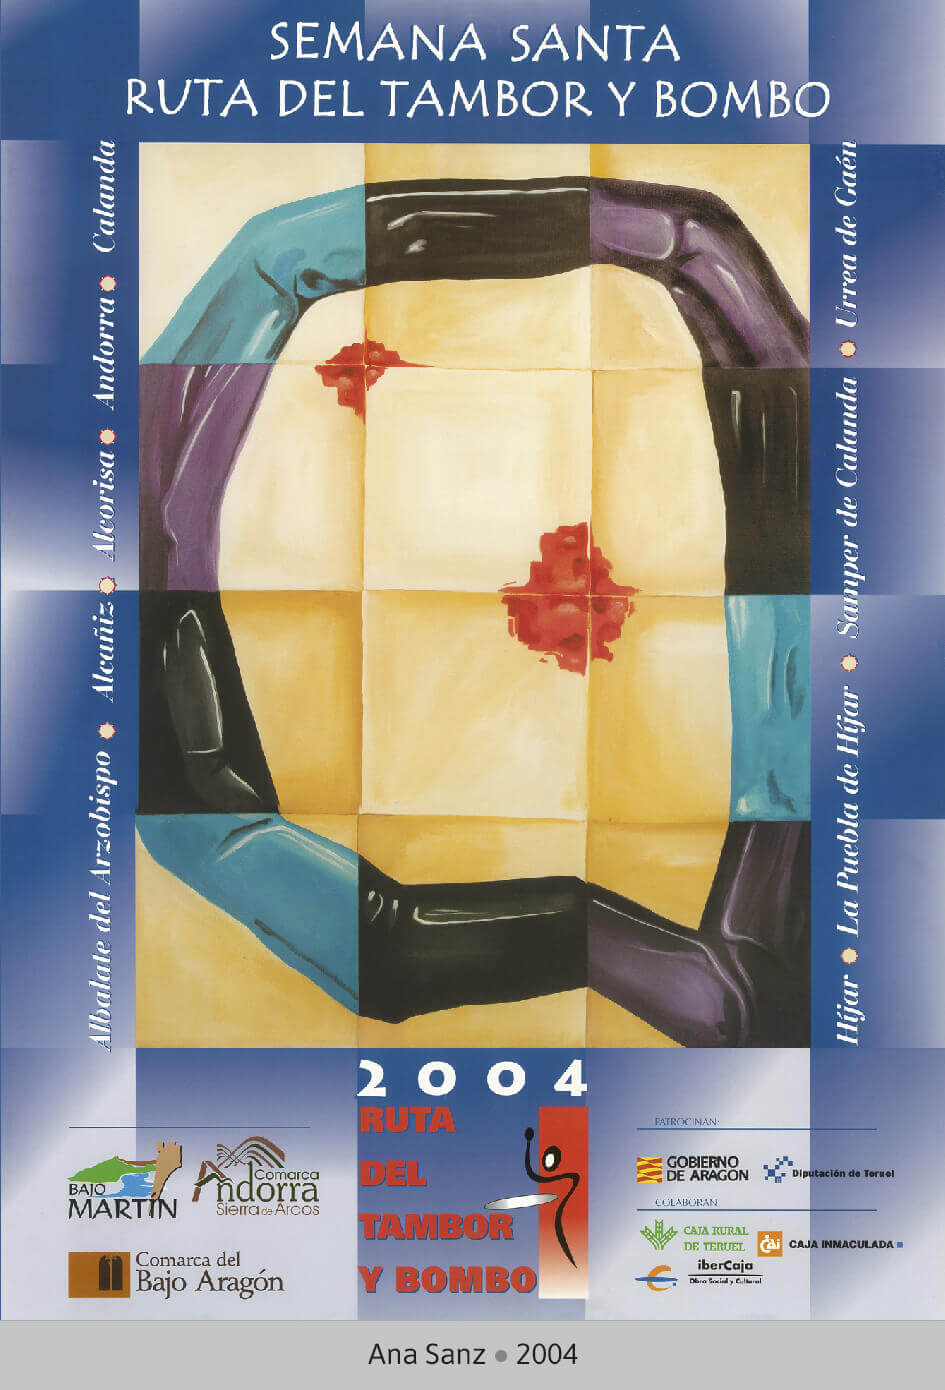 Cartel Ganador Ruta del Tambor y Bombo. Semana Santa 2004